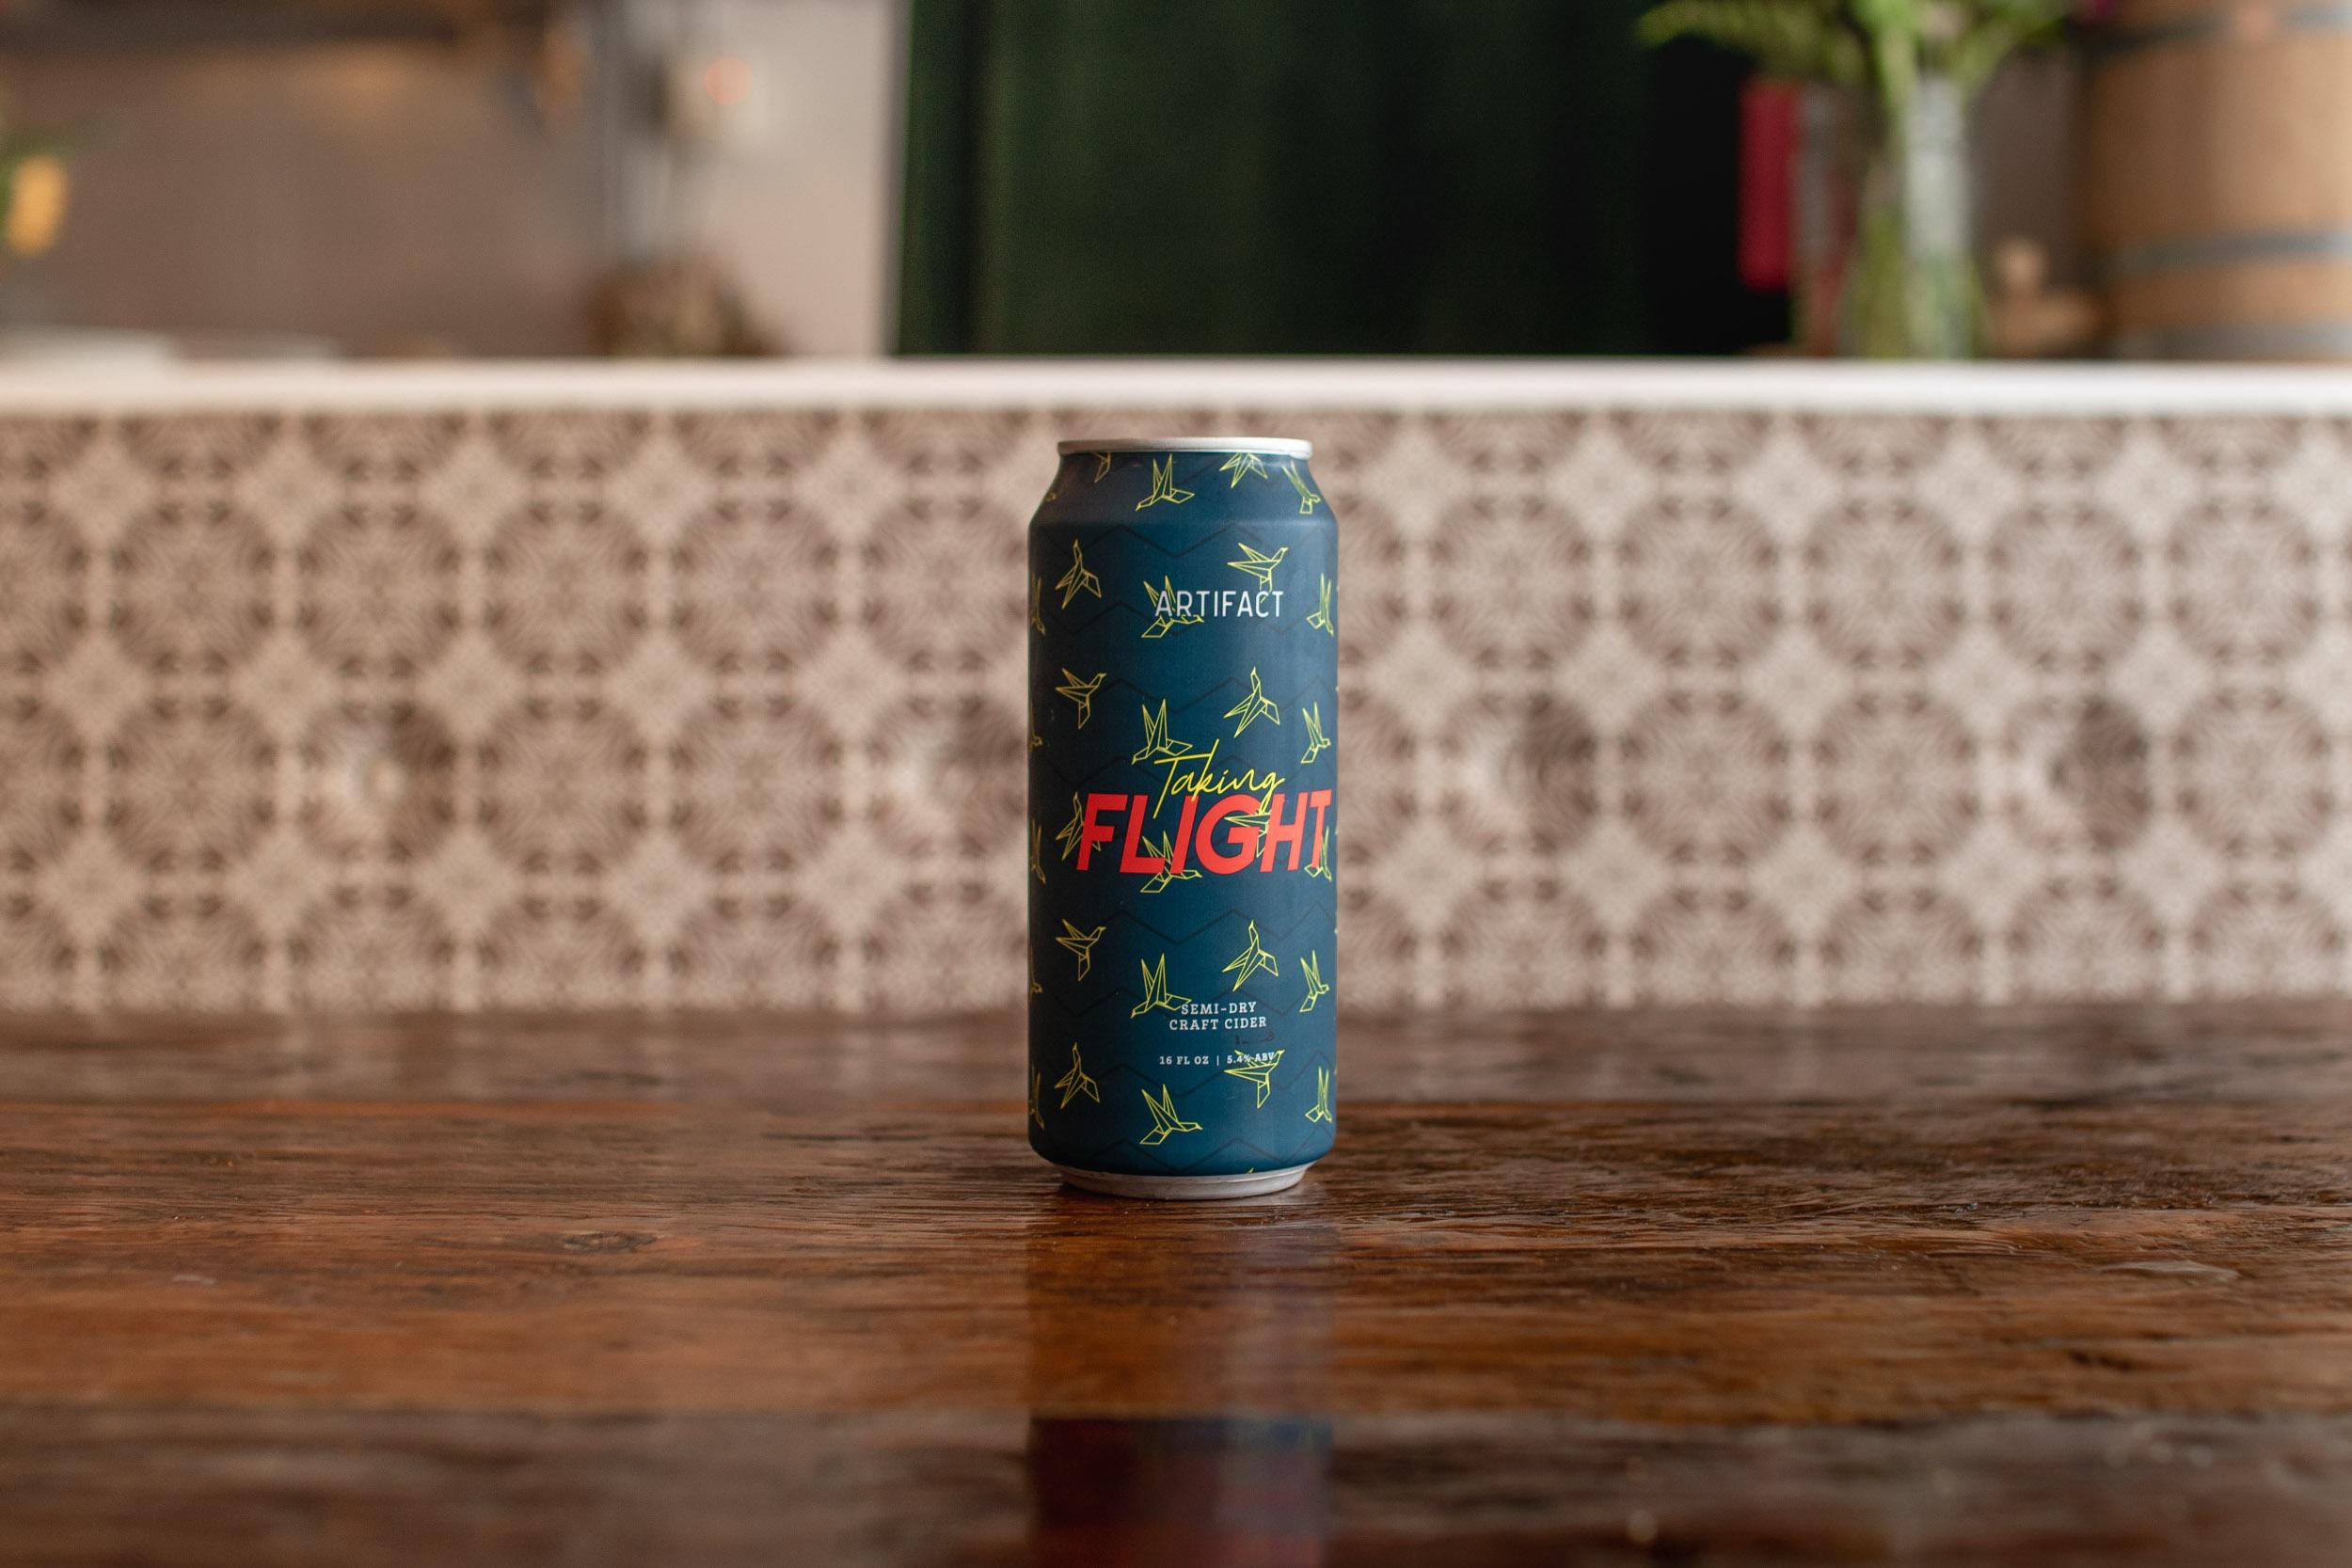 Artifact Cider's Taking Flight // photo by Stephanie Cornell